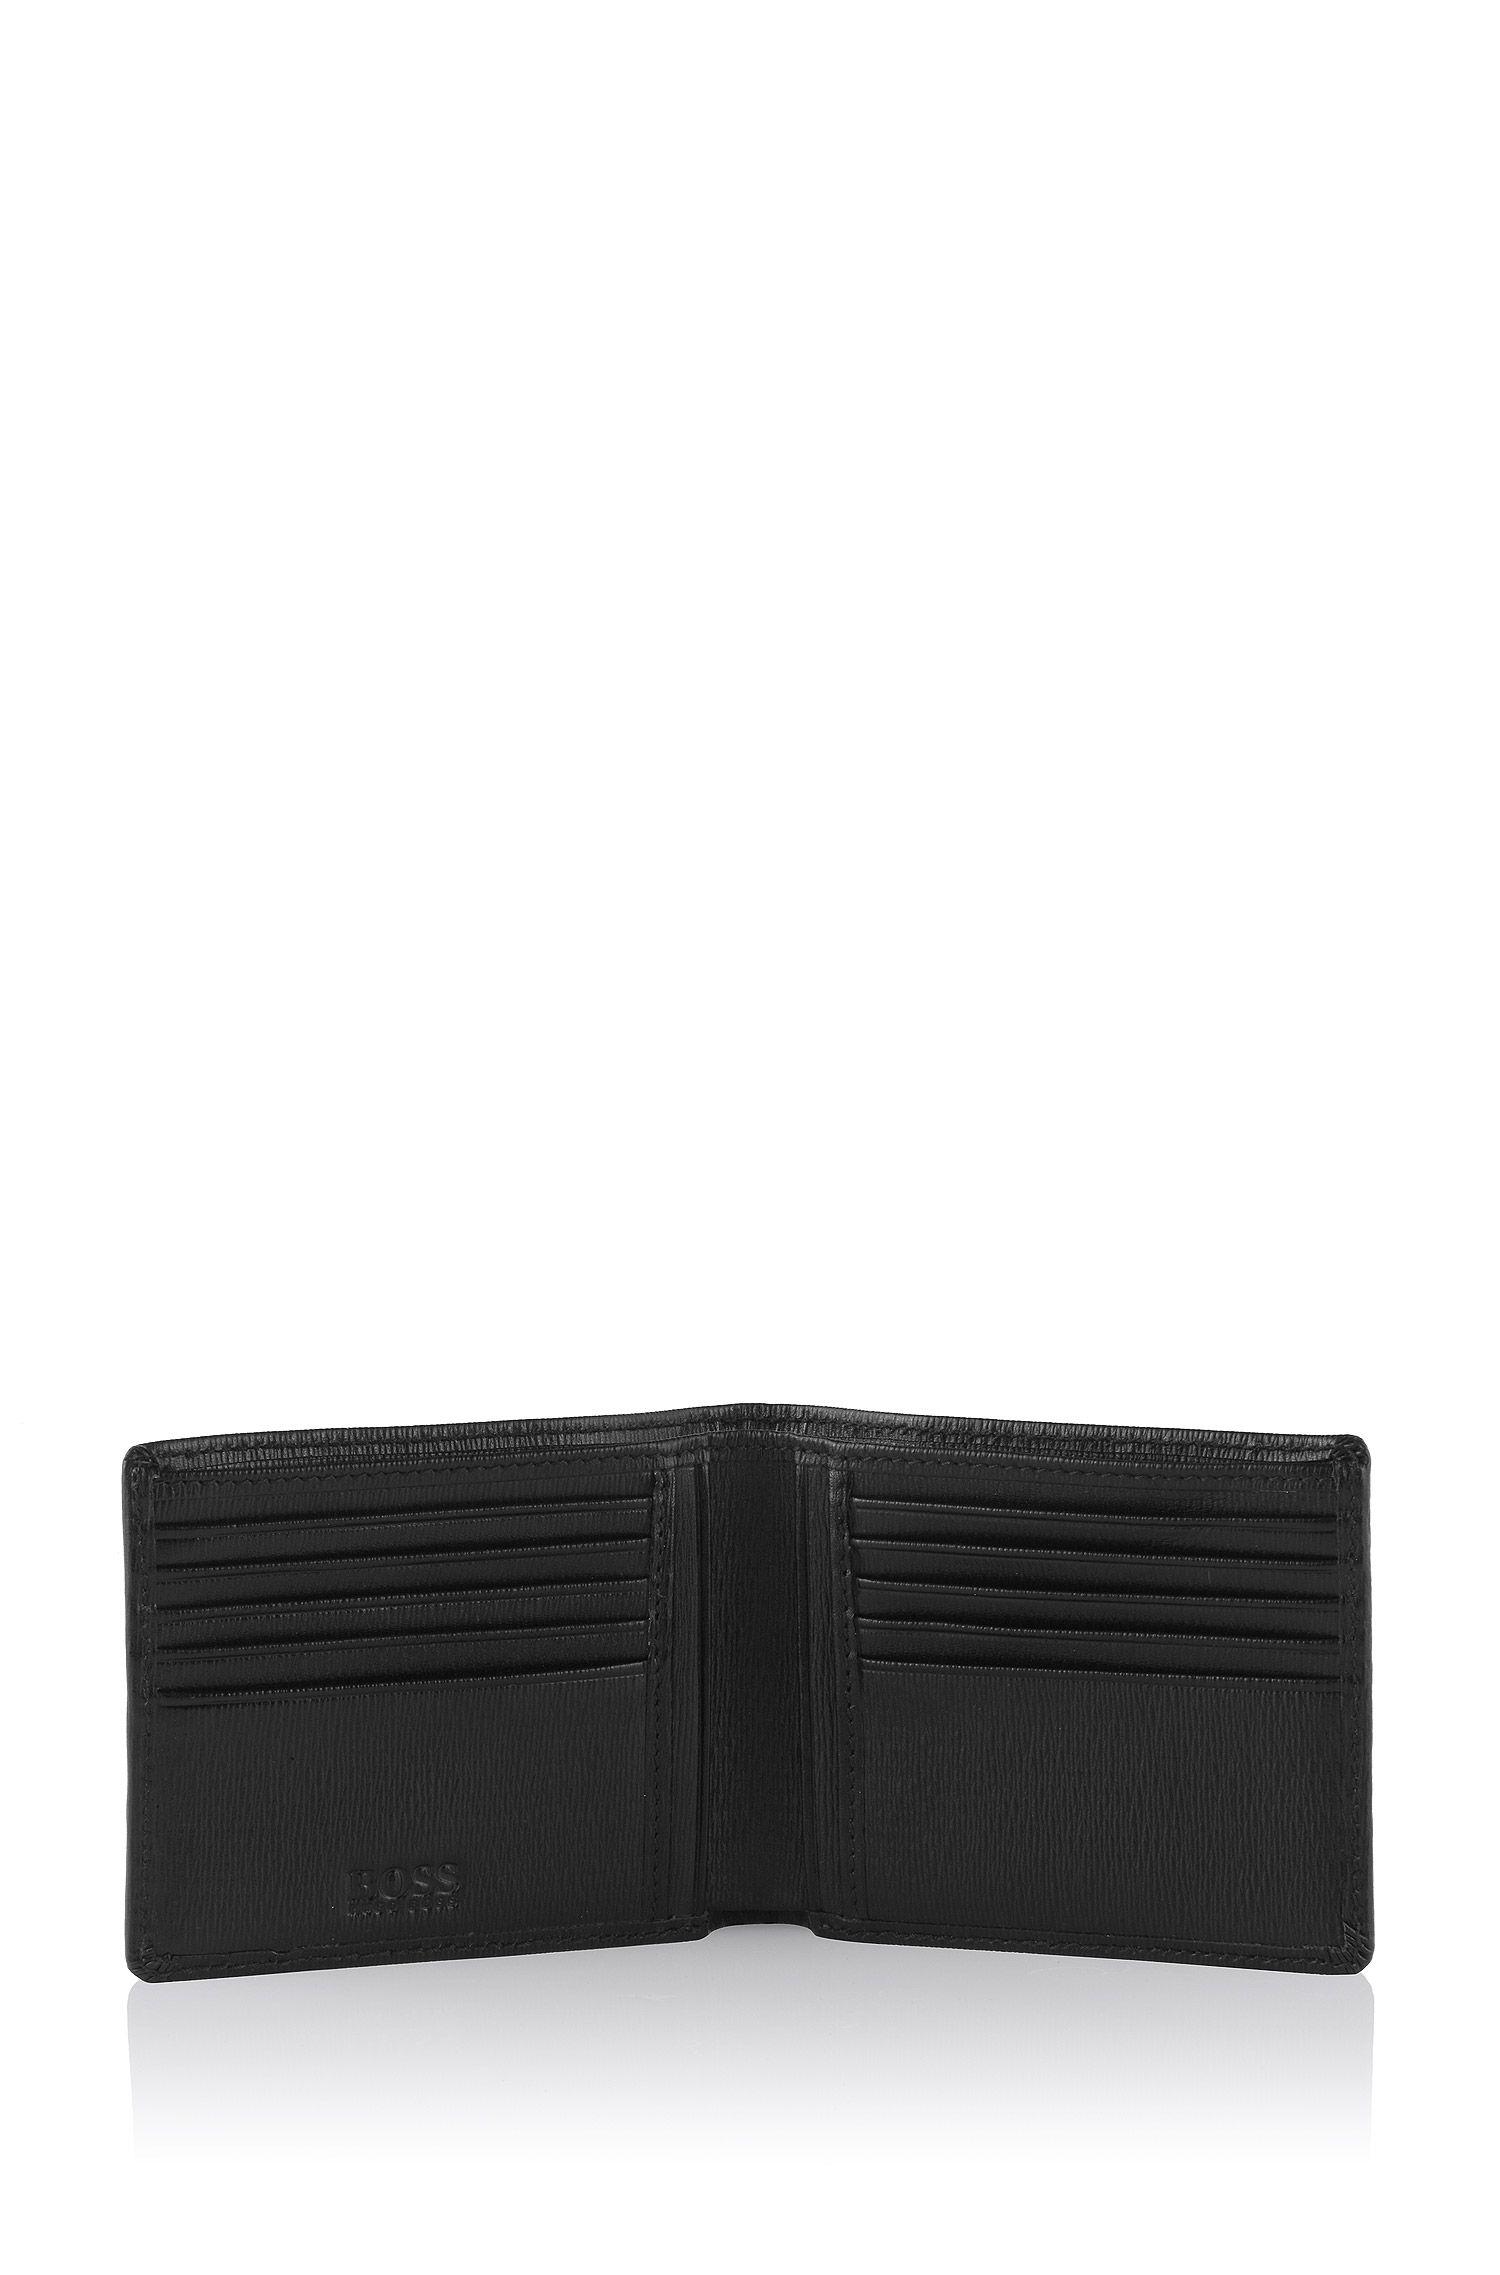 Portemonnaie ´LONDON` aus Rindsleder